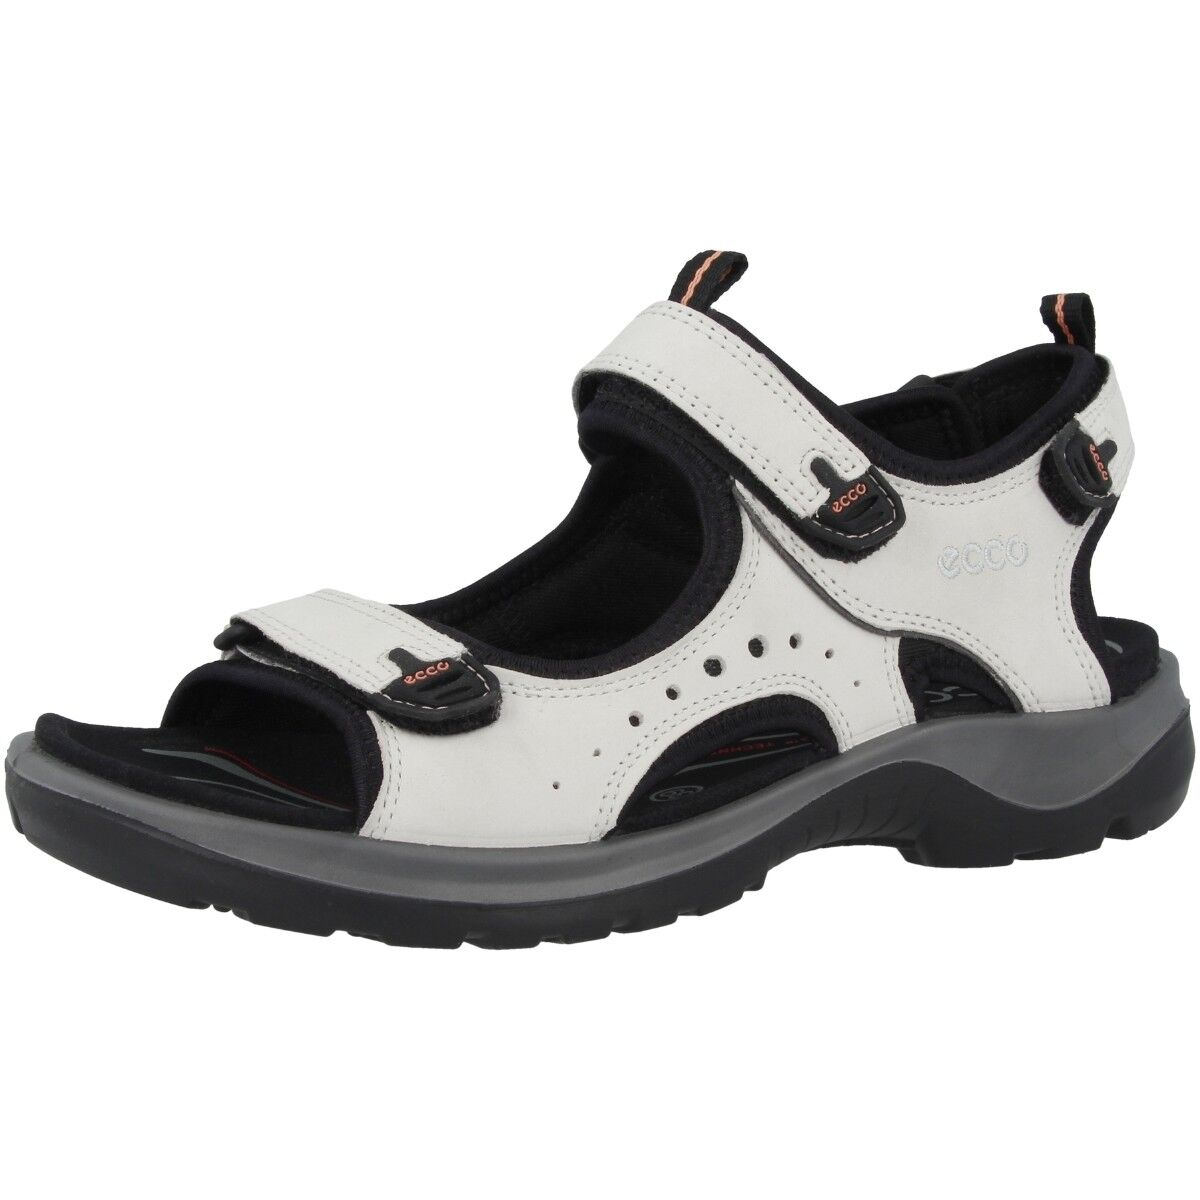 Ecco todoterreno Andes II Ladies señora trekking sandalia zapatos blanco 822043-02152